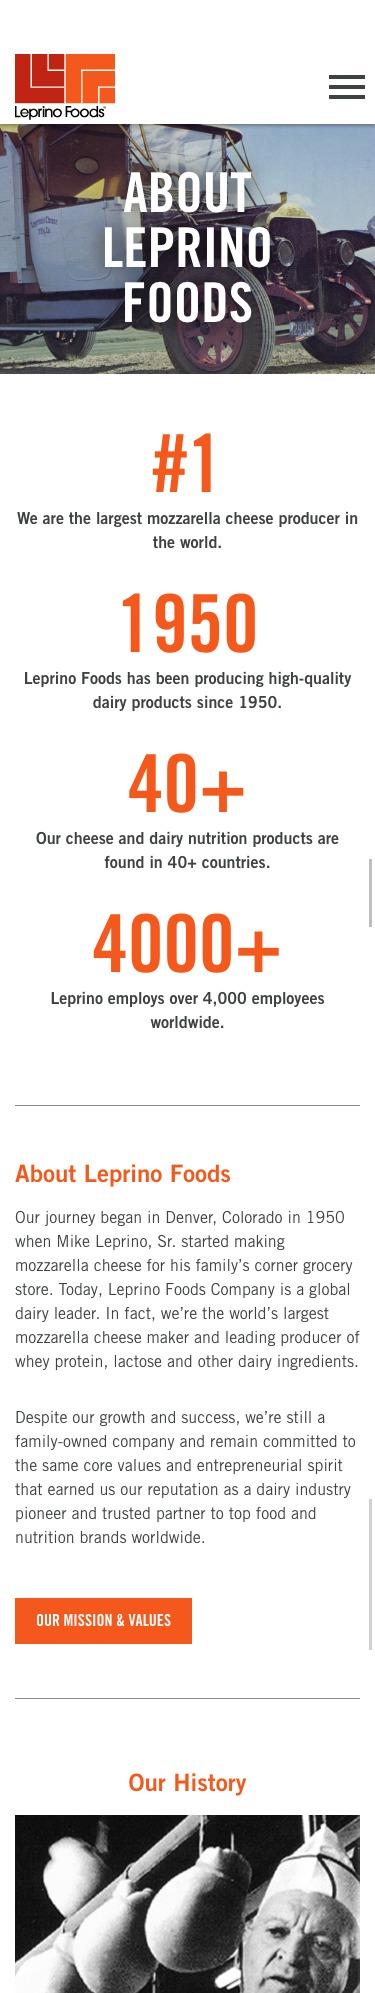 Leprino Foods website mobile